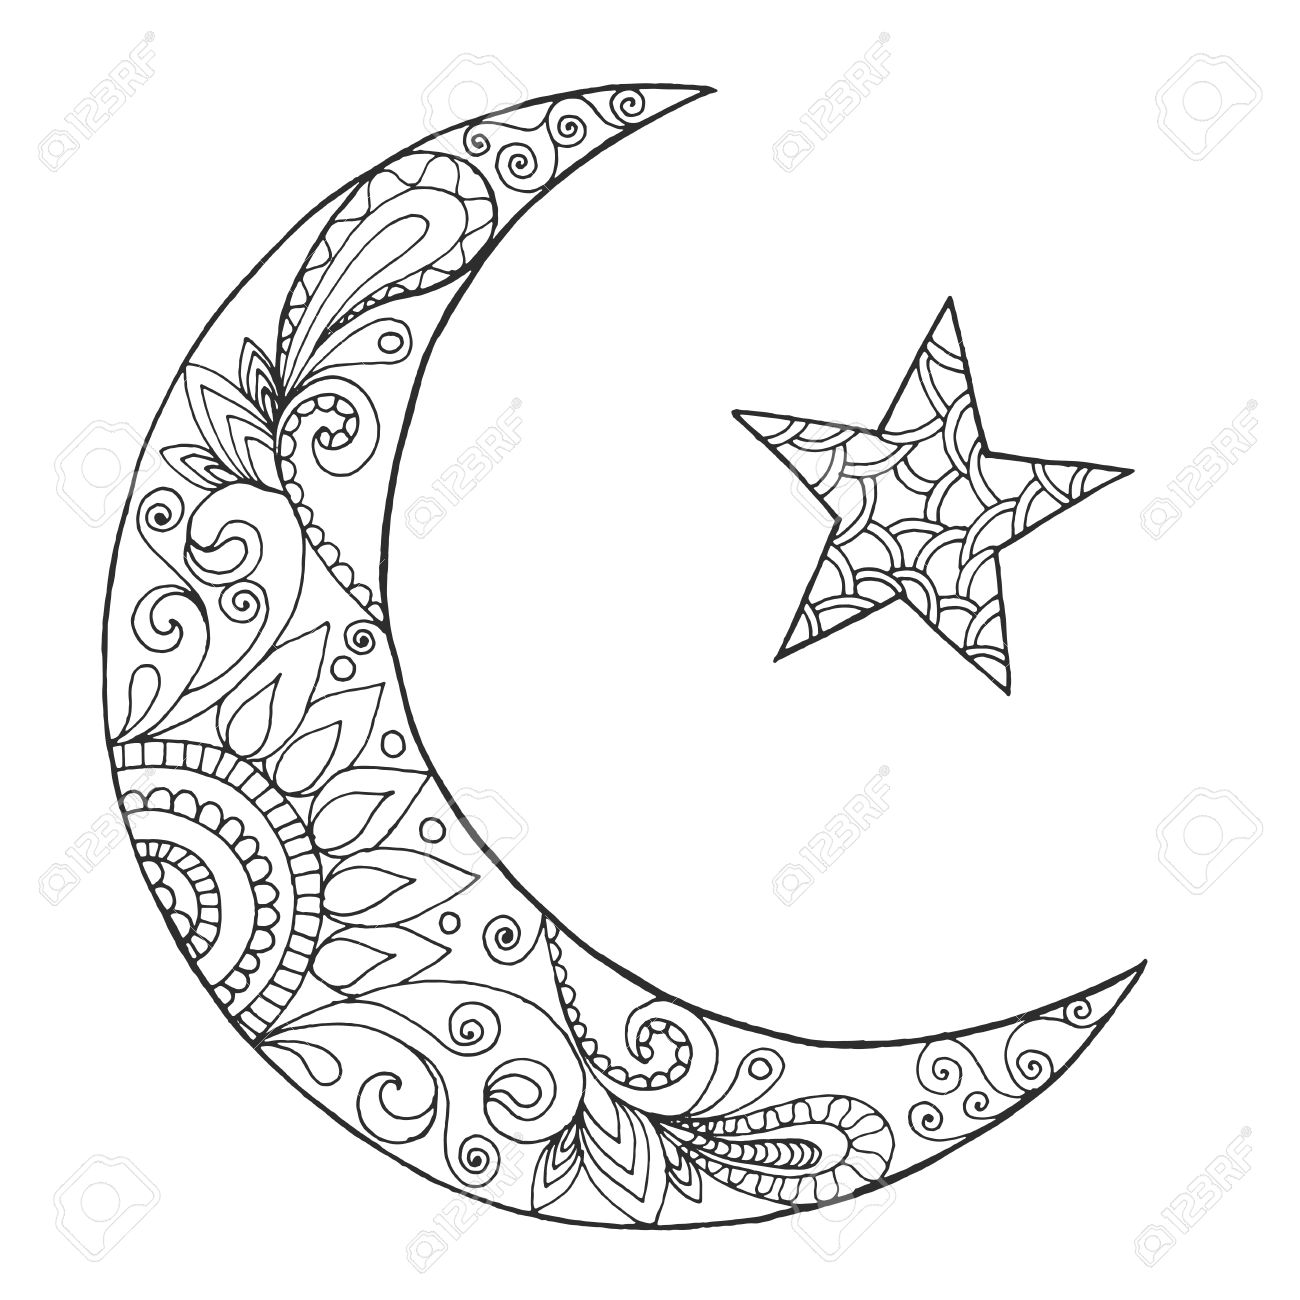 Ramadan Kareem Half Moon Greeting Design Coloring Page Engraved Ramadan Coloring Pages